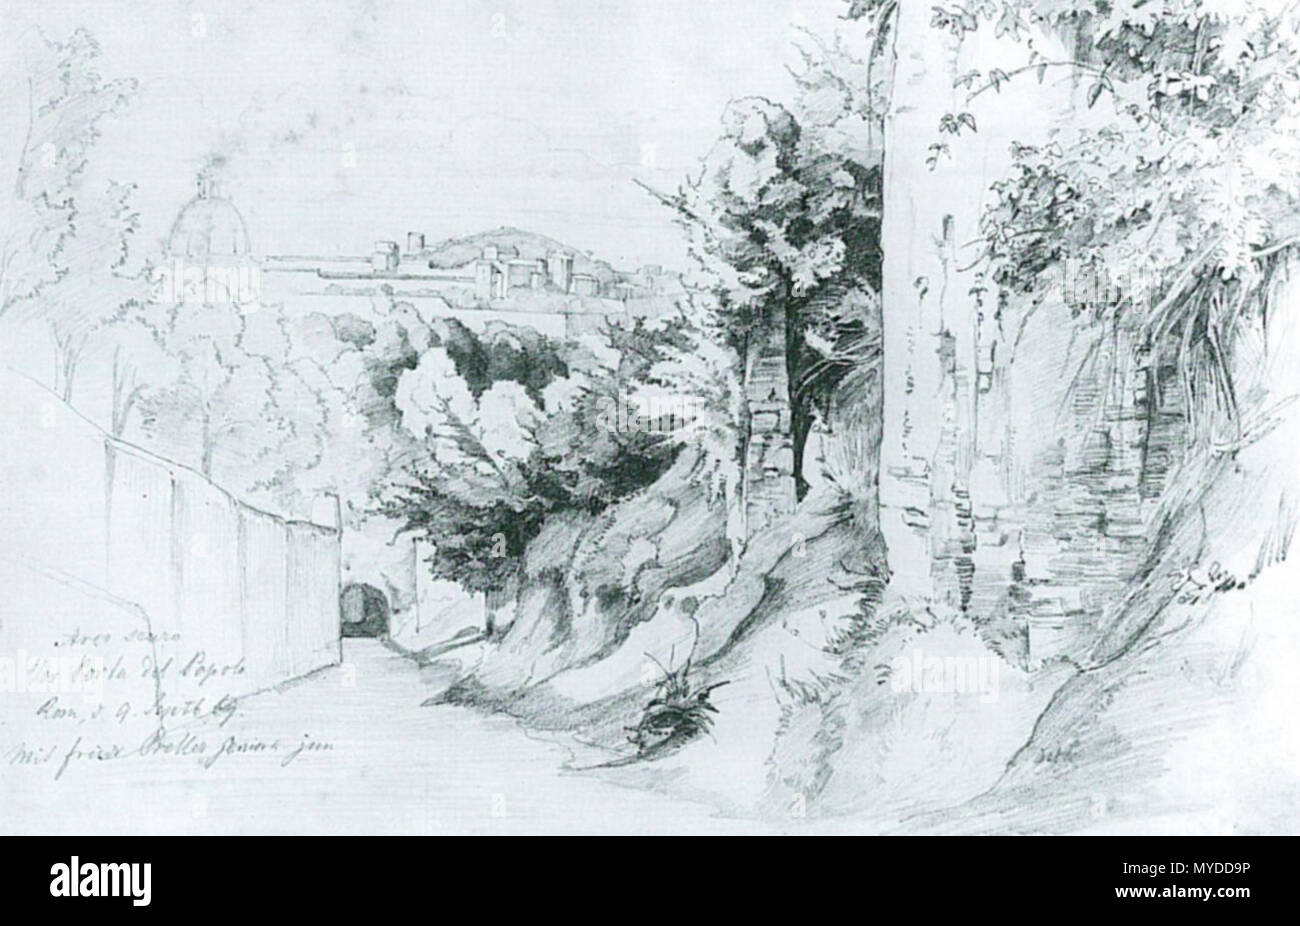 . Deutsch: Edmund Kanoldt: Arco scuro vor Porta del Popolo. 17,2 × 27,1 cm. Bleistift auf Papier. La Kunsthalle di Mannheim . circa 1869. Edmund Kanoldt (1845-1904) 153 Edmund Kanoldt Arco scuro vor Porta del Popolo Immagini Stock